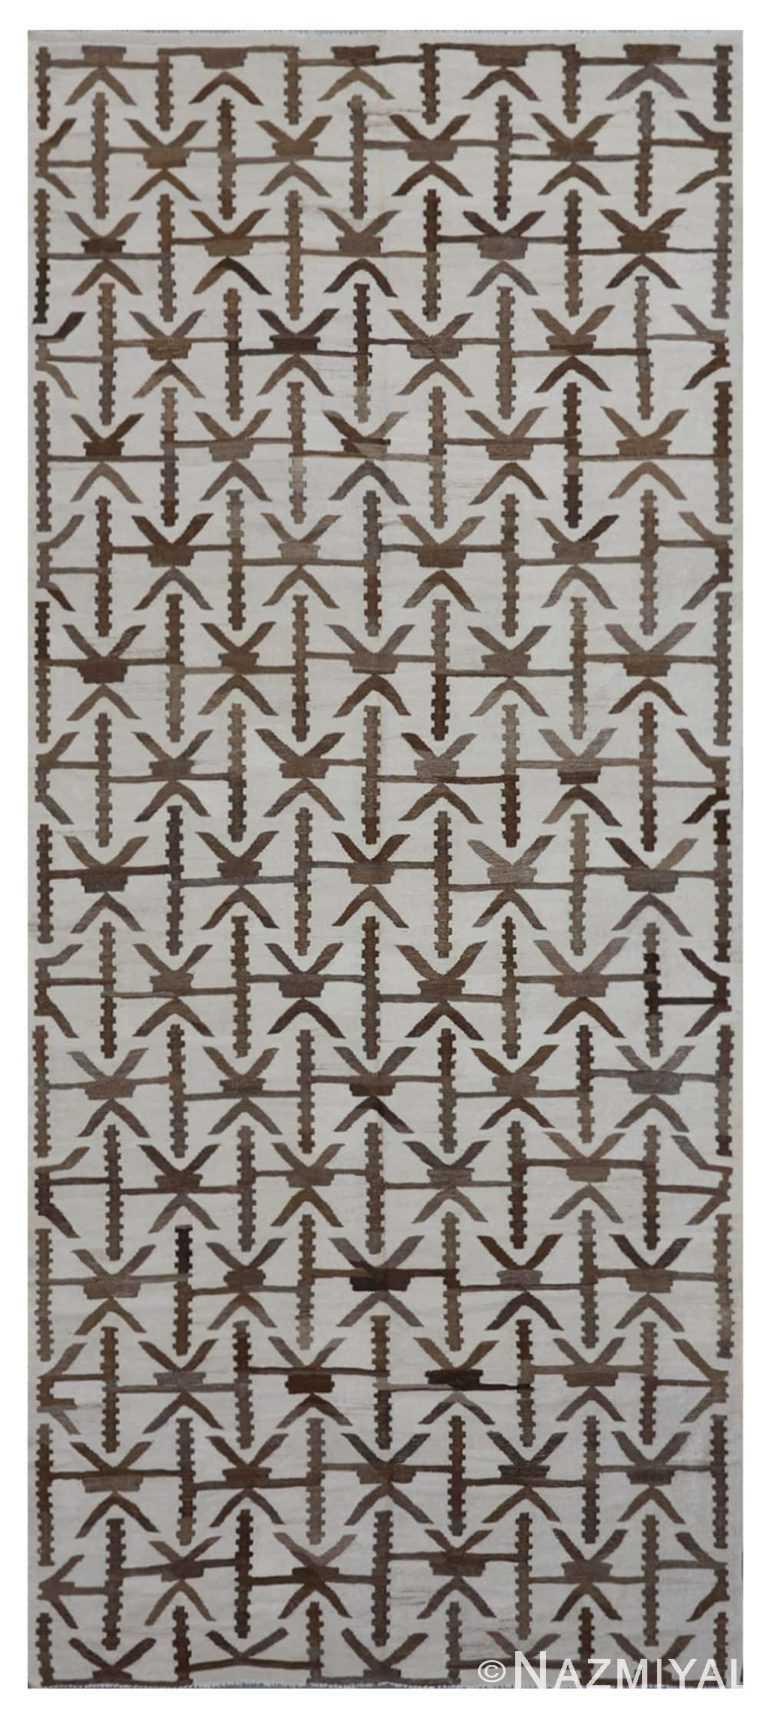 Modern Flat Weave Rug 801780371 by Nazmiyal NYC